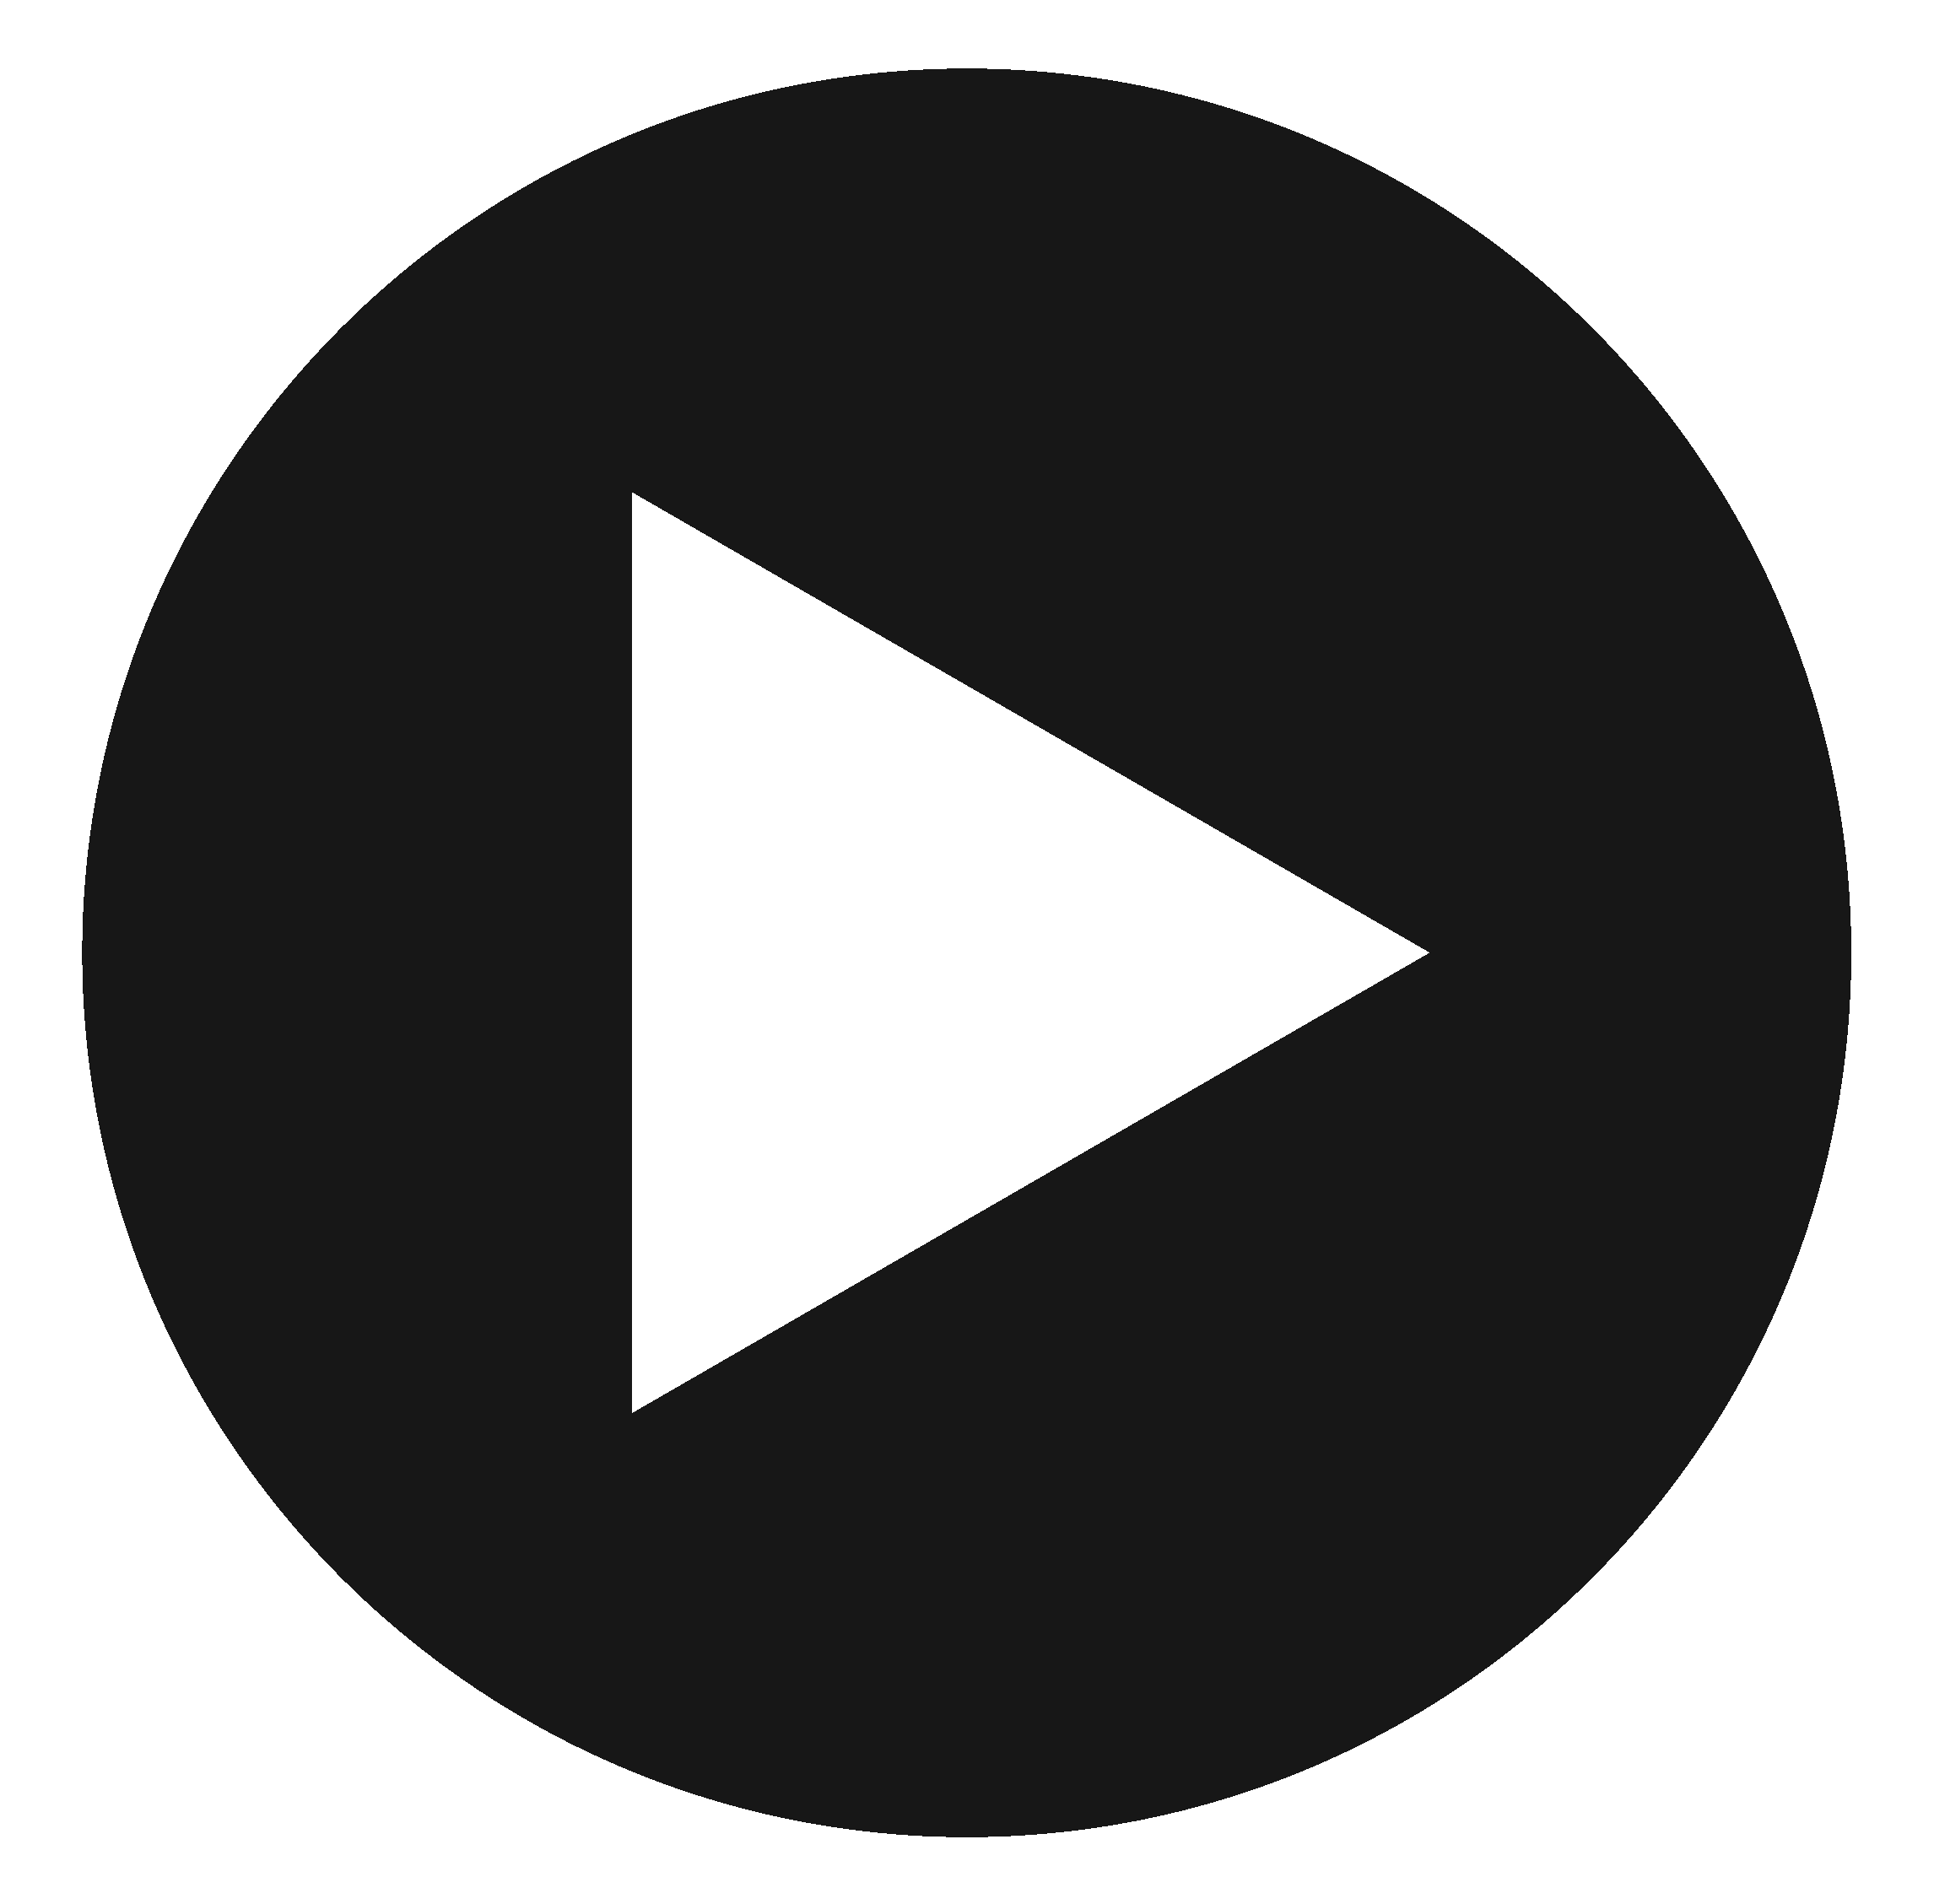 Logo Play Png